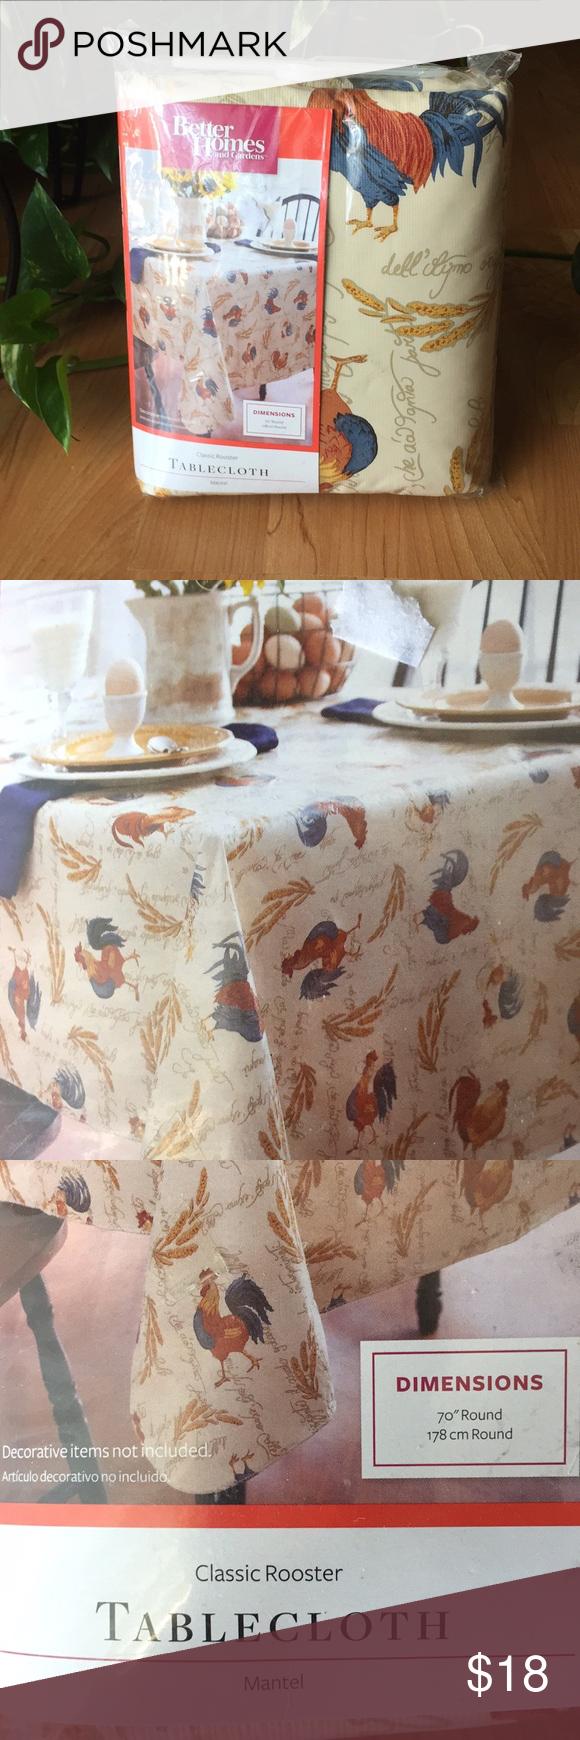 6a5ba1e8f4386b9a92553ee3f755733f - Better Homes And Gardens Holiday Edition Tablecloth